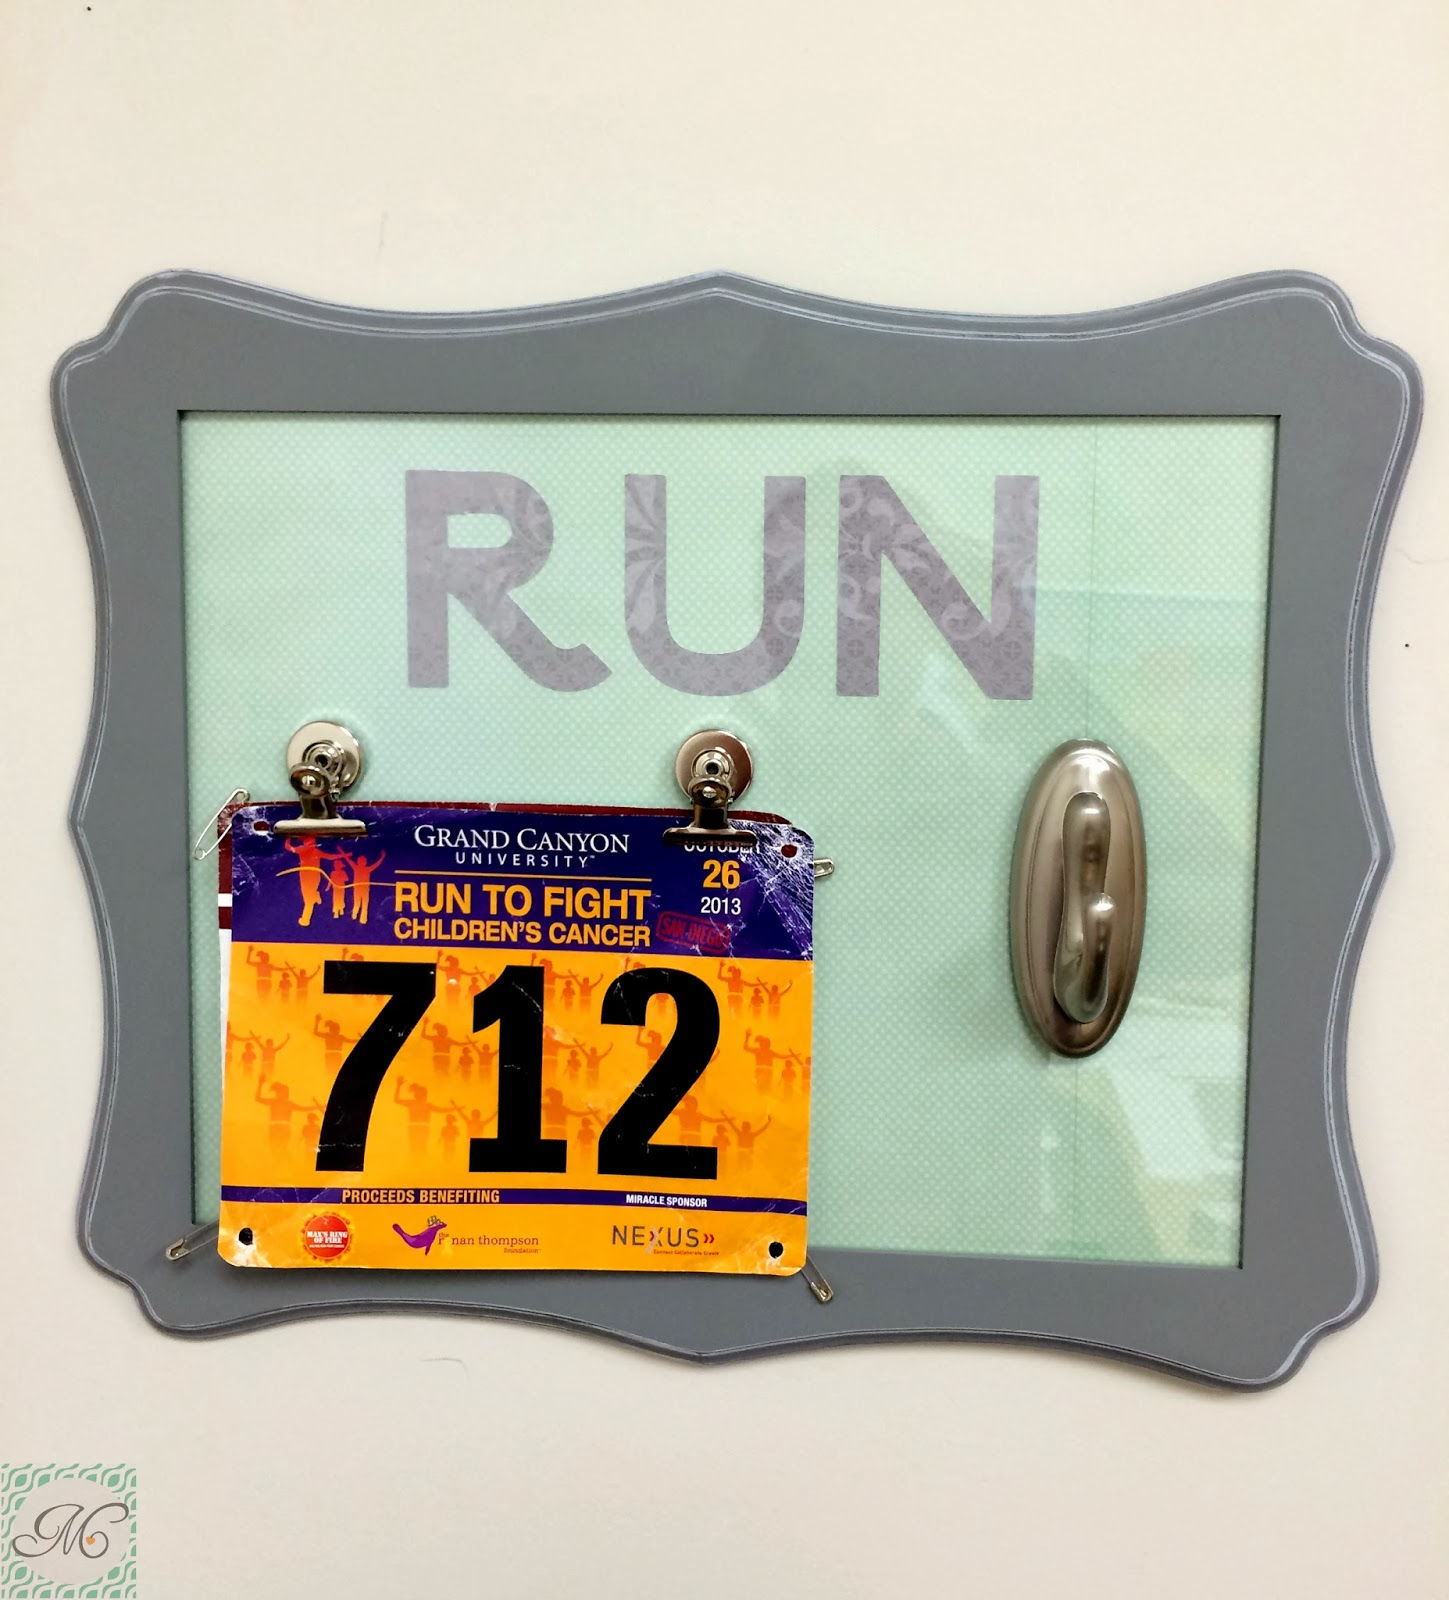 Mejia Mamma Diy Race Bib Medal Display